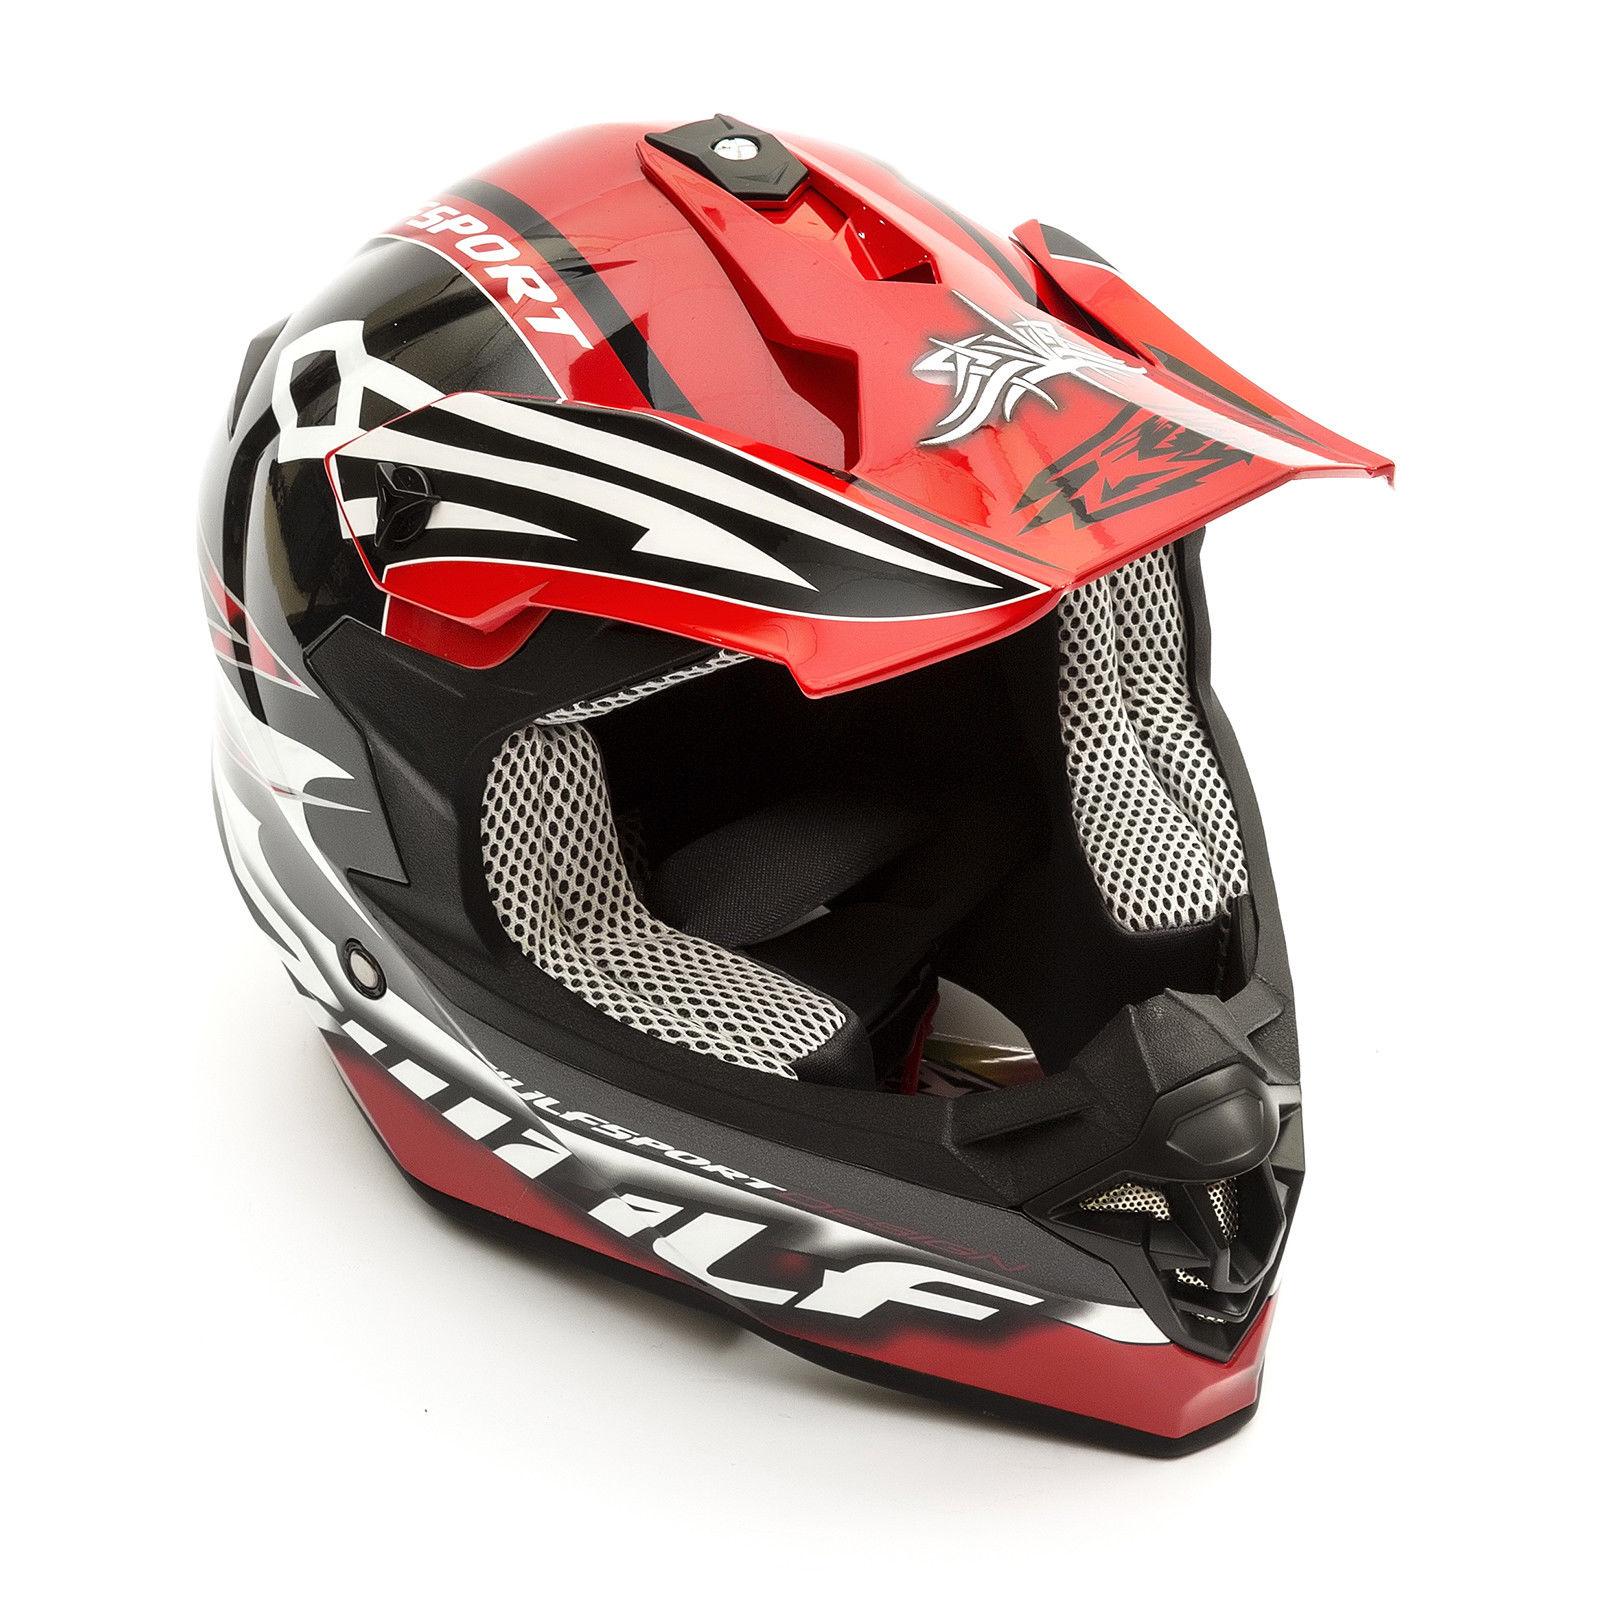 Wulfsport-Adult-Sceptre-Helmets-Motocross-Pitbike-Motorbike-Off-Road-Racing-ATV thumbnail 33